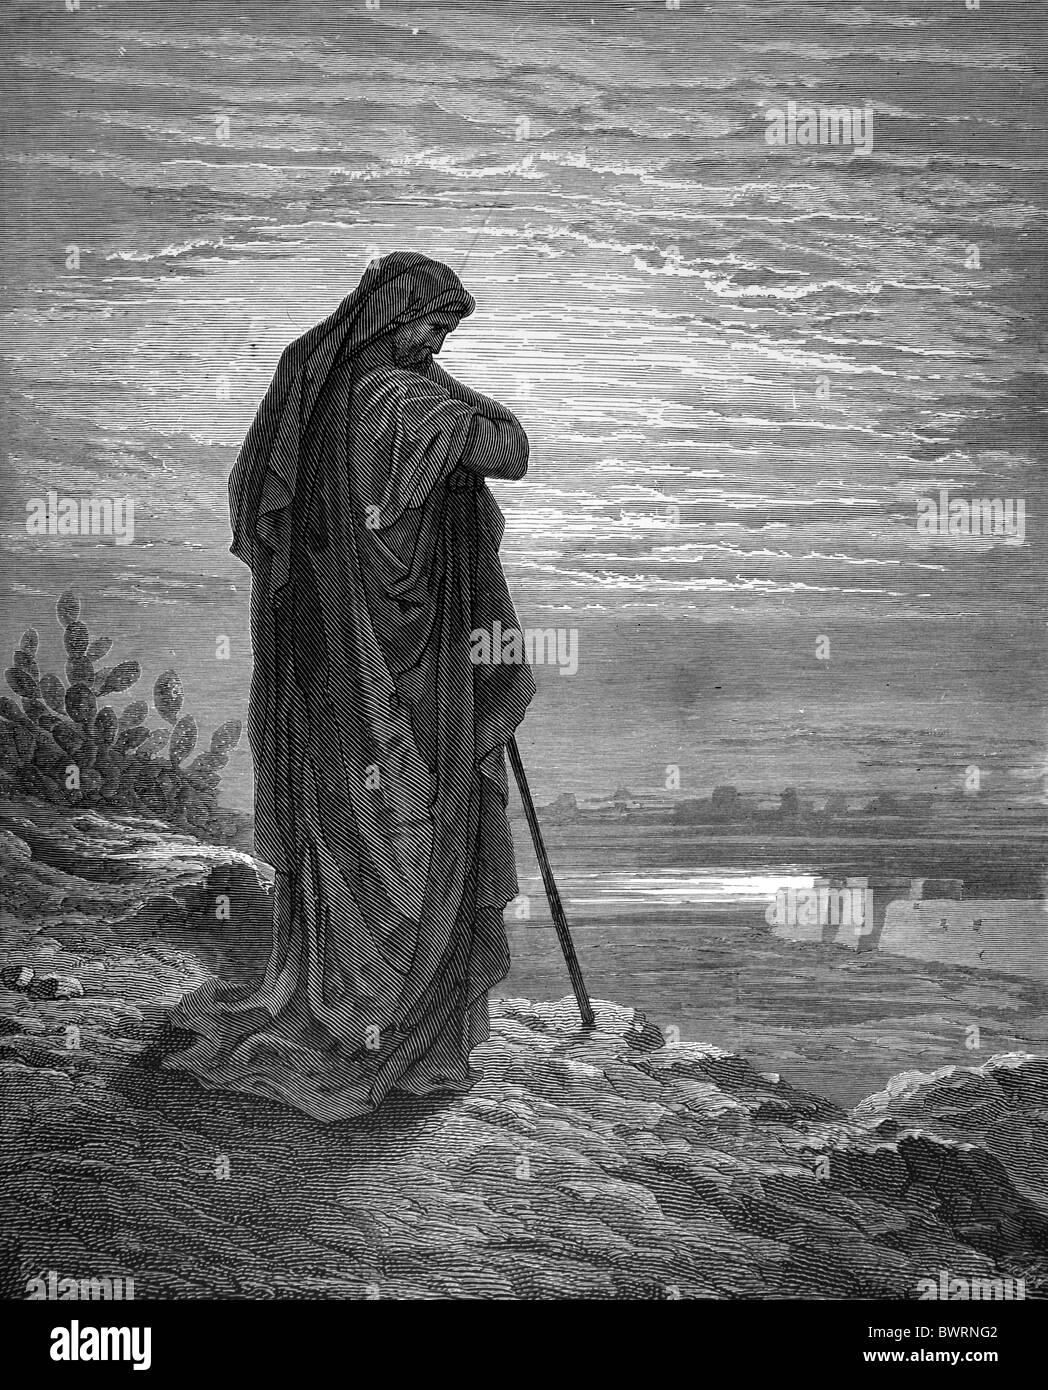 Gustave Doré; Amos, Herdman of Tekoa; Black and White Engraving - Stock Image